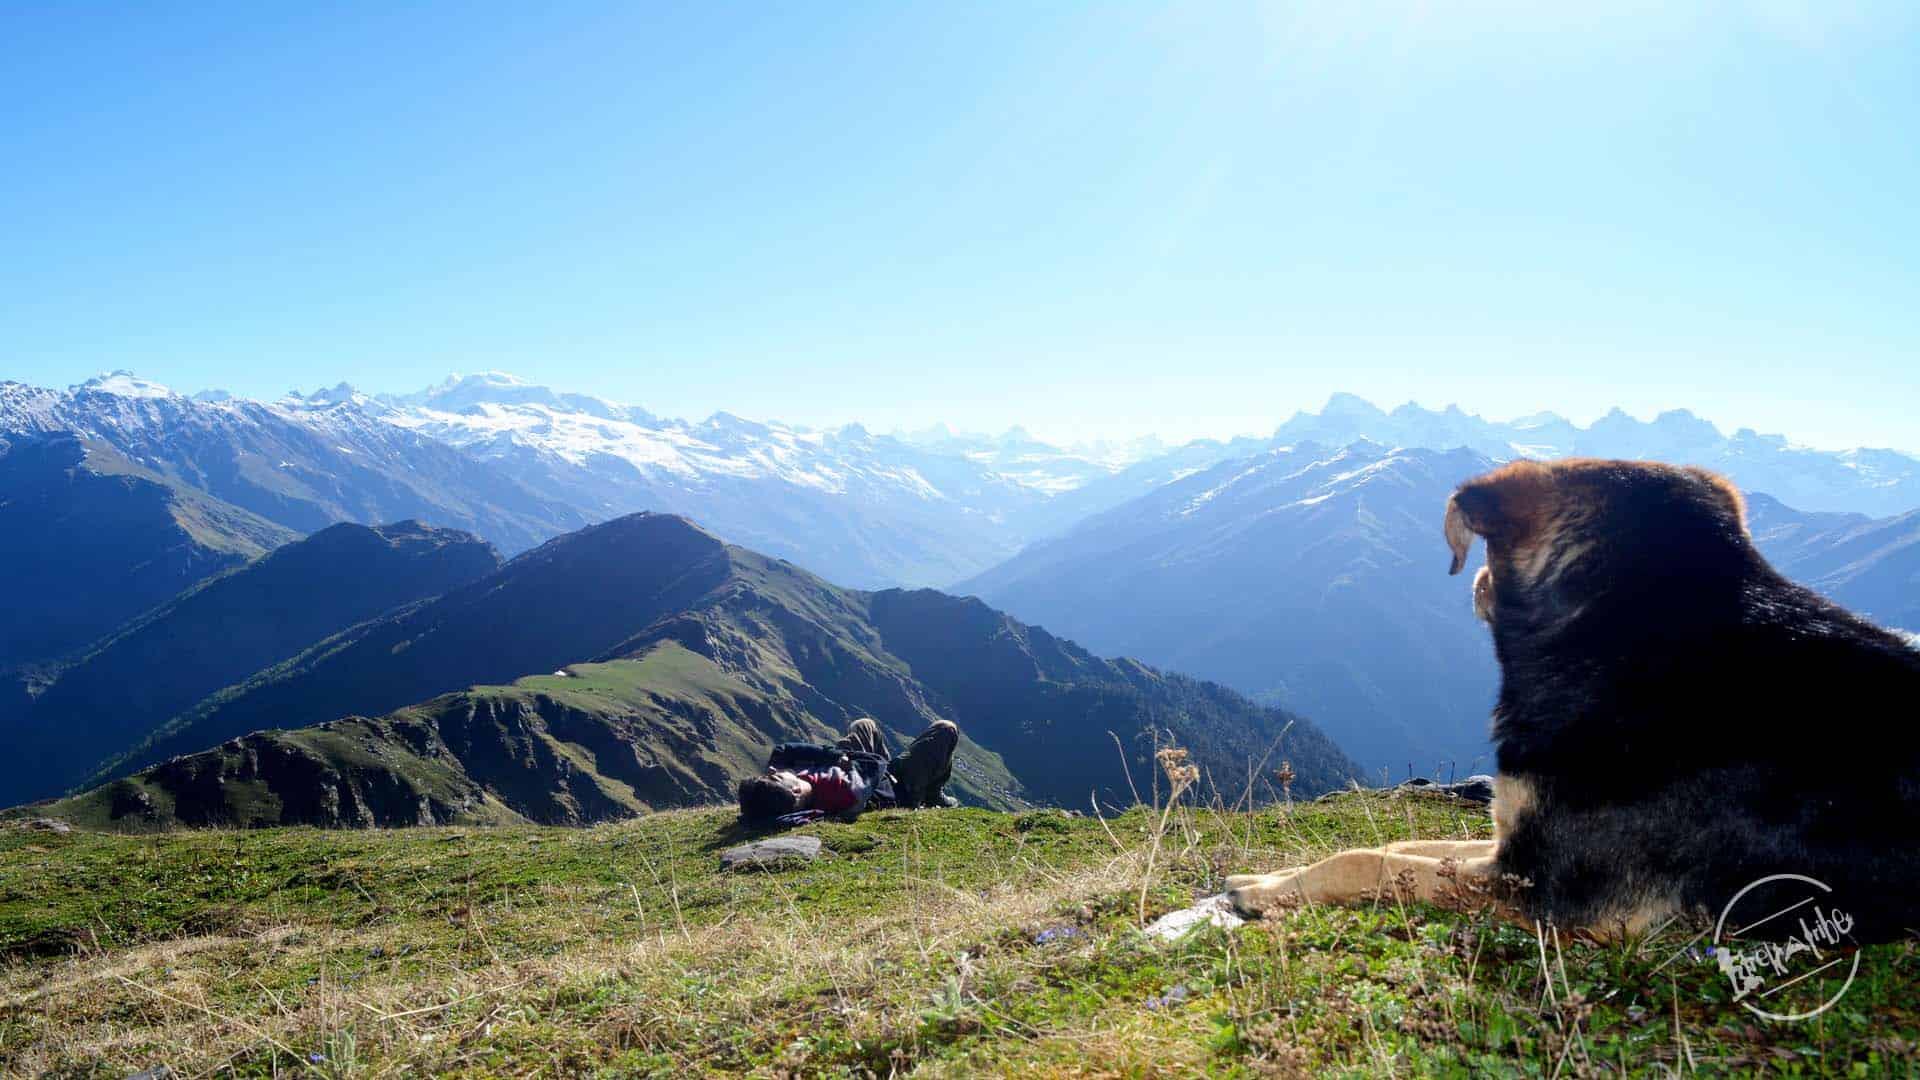 View of Parvati Valley from Chandrakhani pass Trek